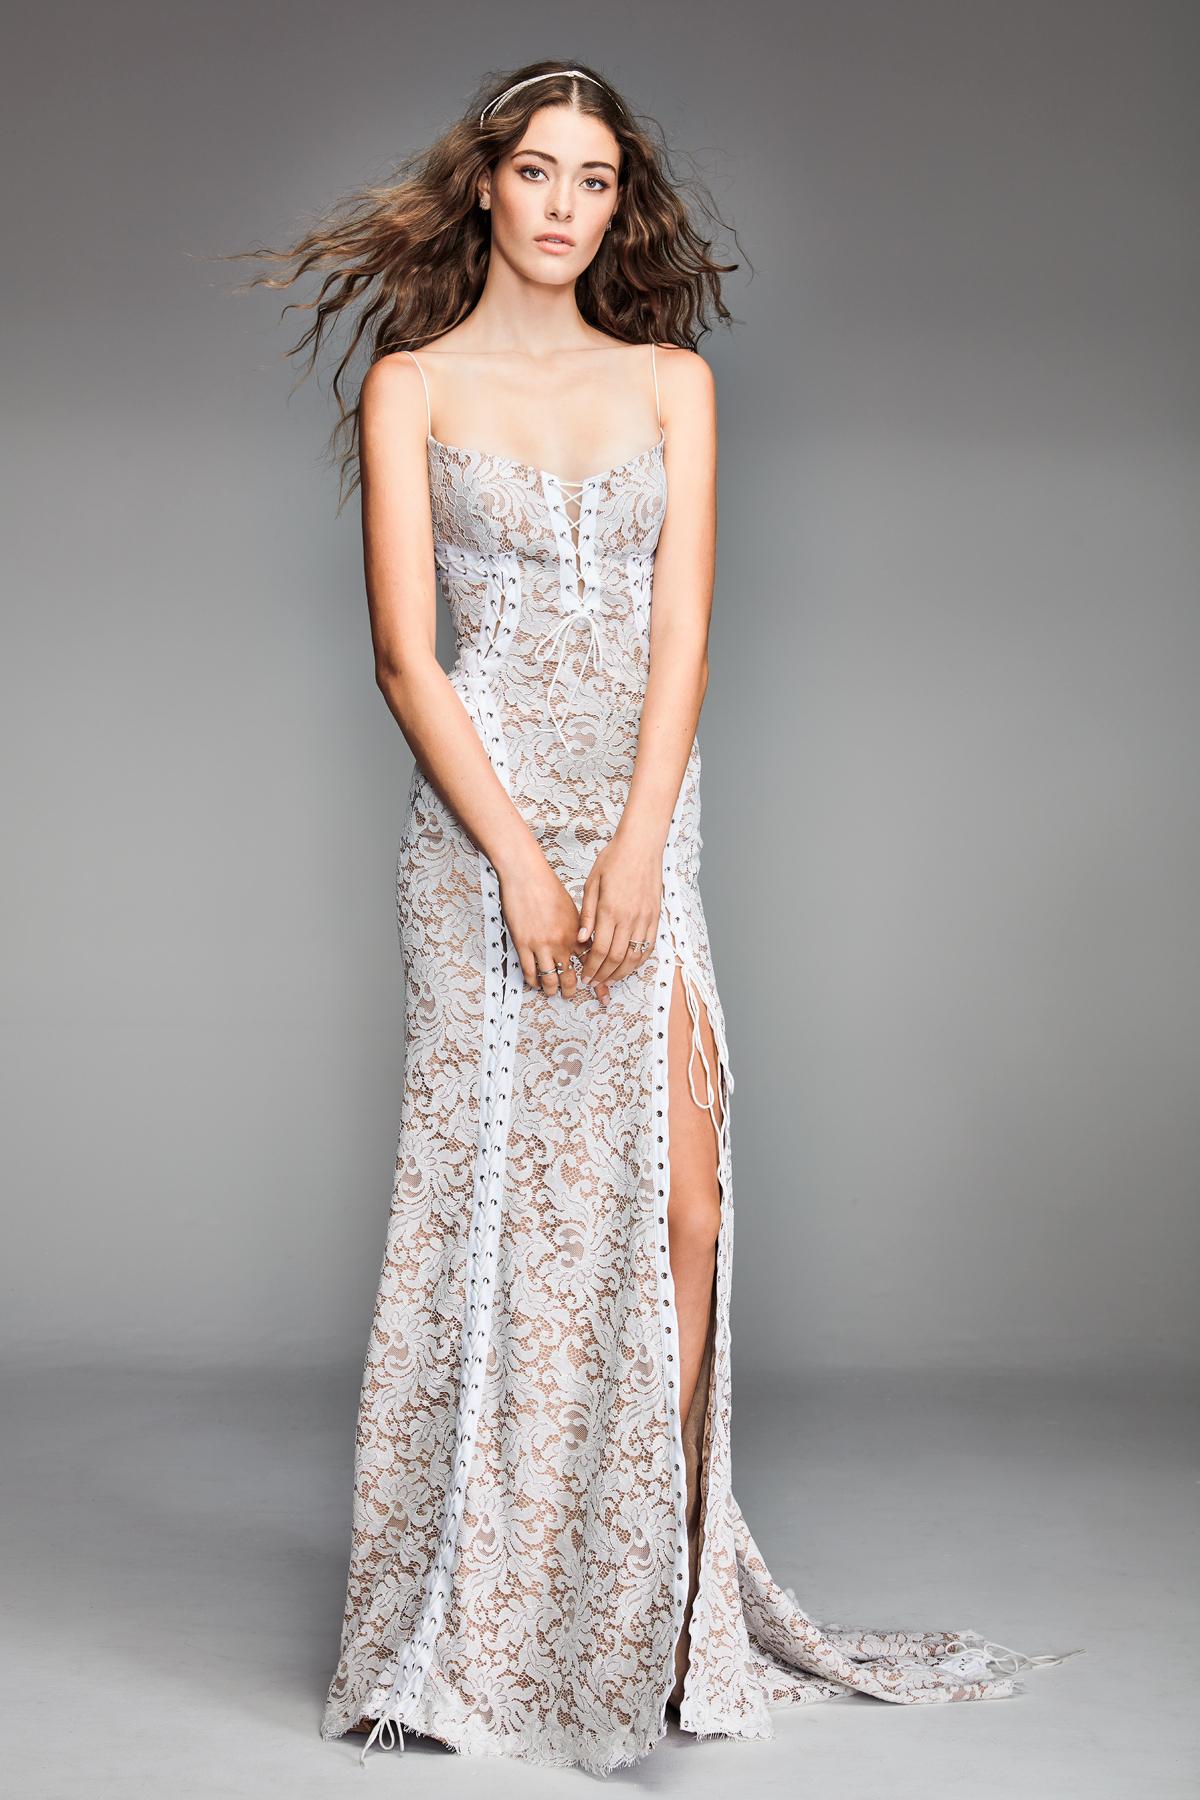 willowby by watters 2018 spaghetti strap lace wedding dress